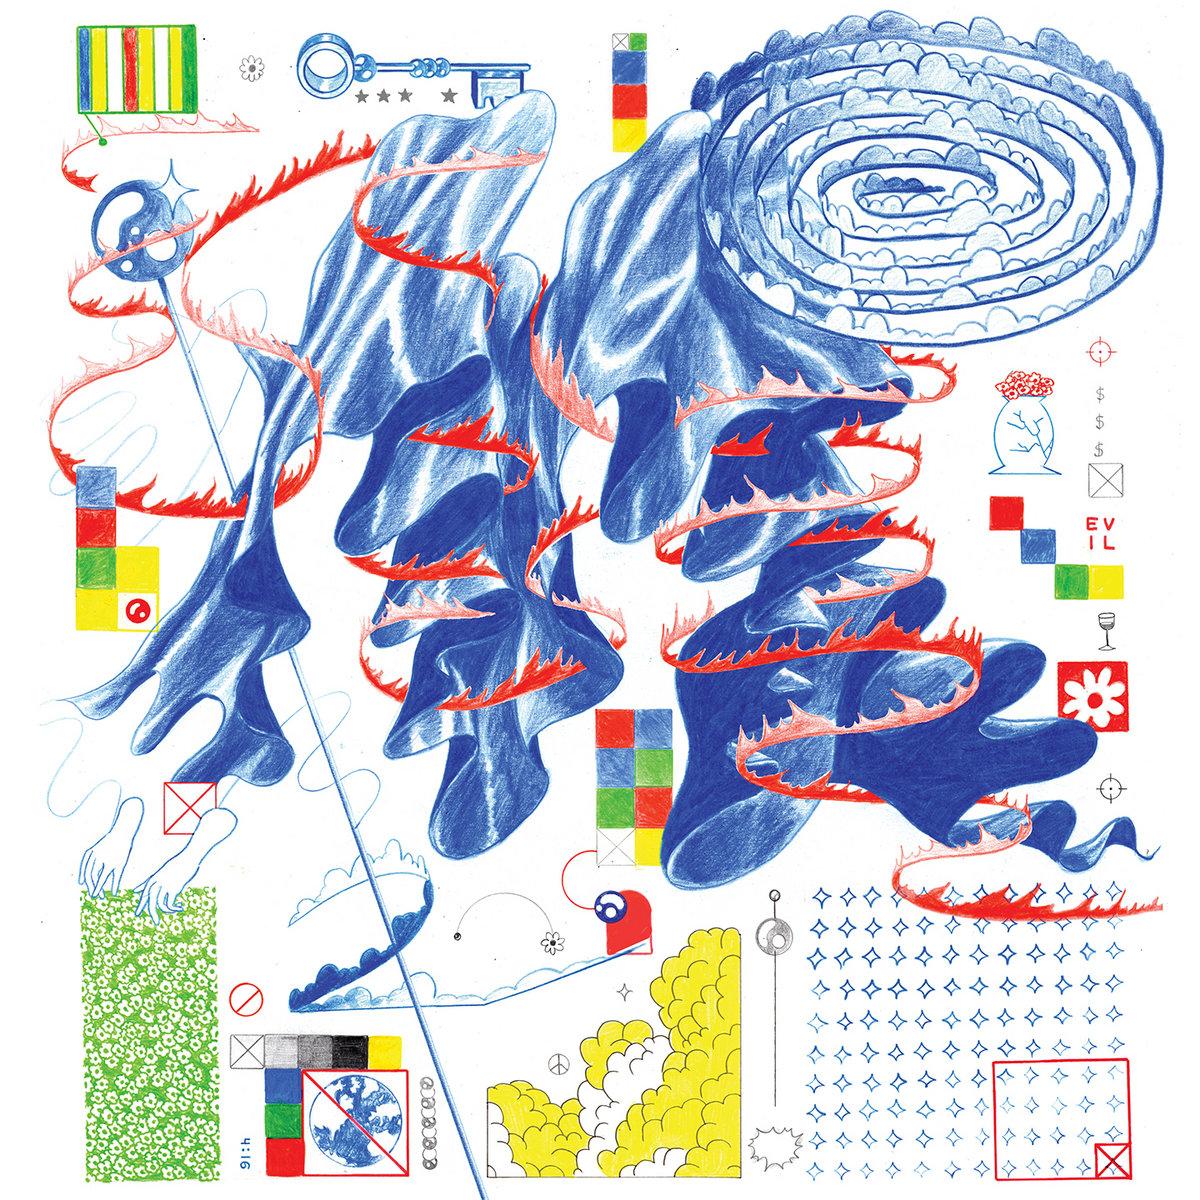 Goon - Natural Evil LP